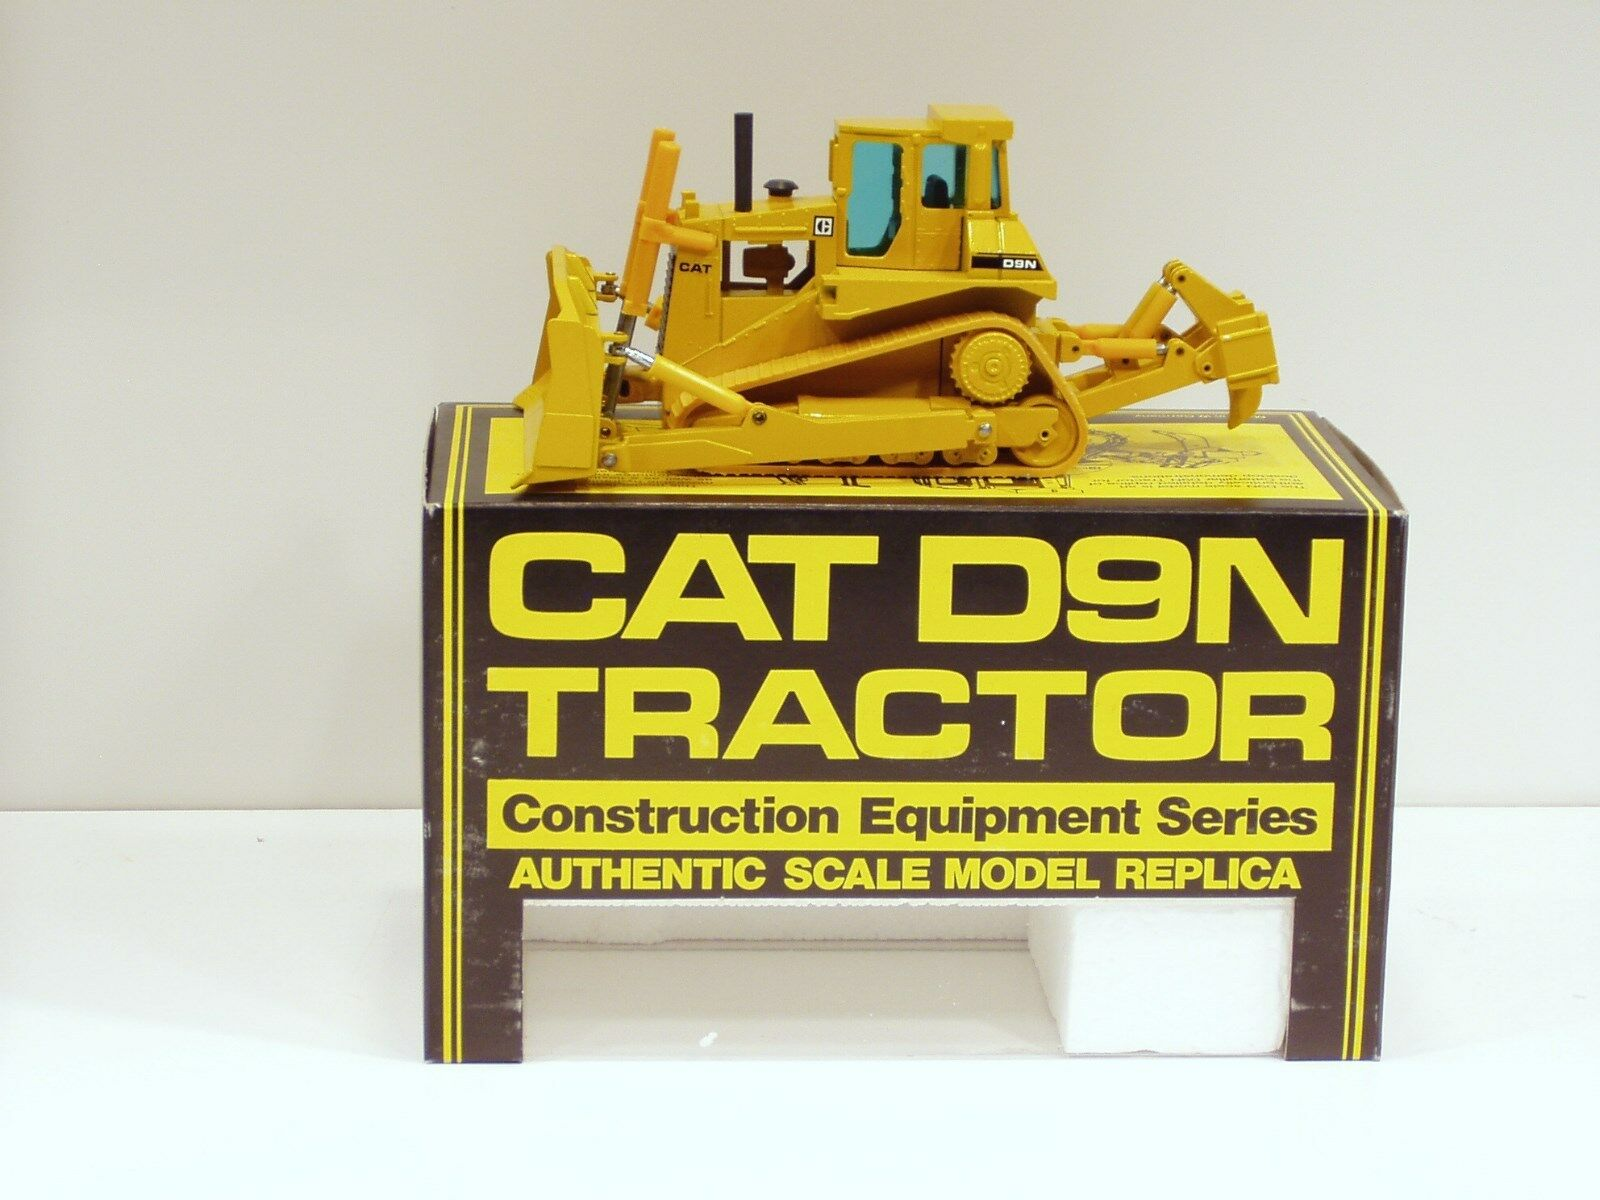 excelentes precios Caterpillar D9N Dozer-o c c c B S-NZG  298 - 1 50 - sin Usar En Caja  muchas sorpresas